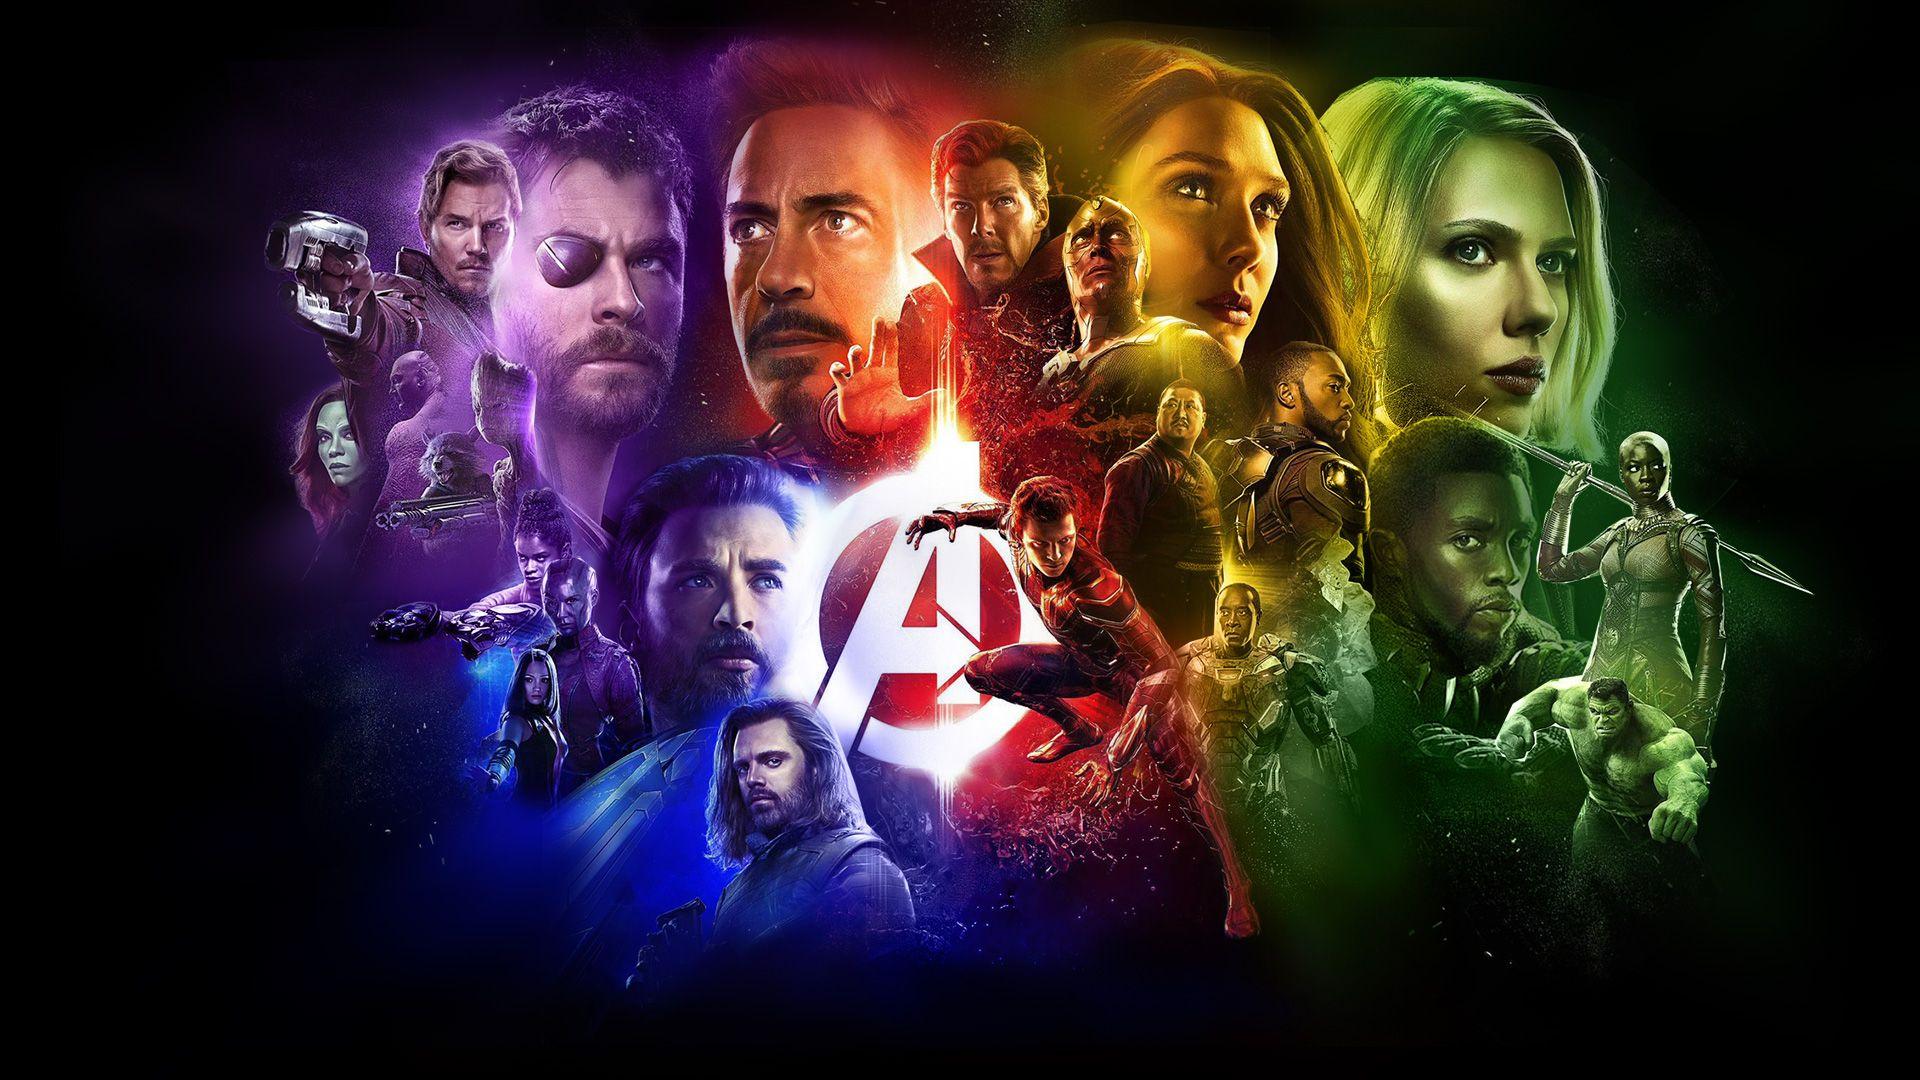 Avengers Infinity War Superheroes Poster Yv Jpg 1920 1080 Avengers Wallpaper Avengers Pictures Avengers Poster